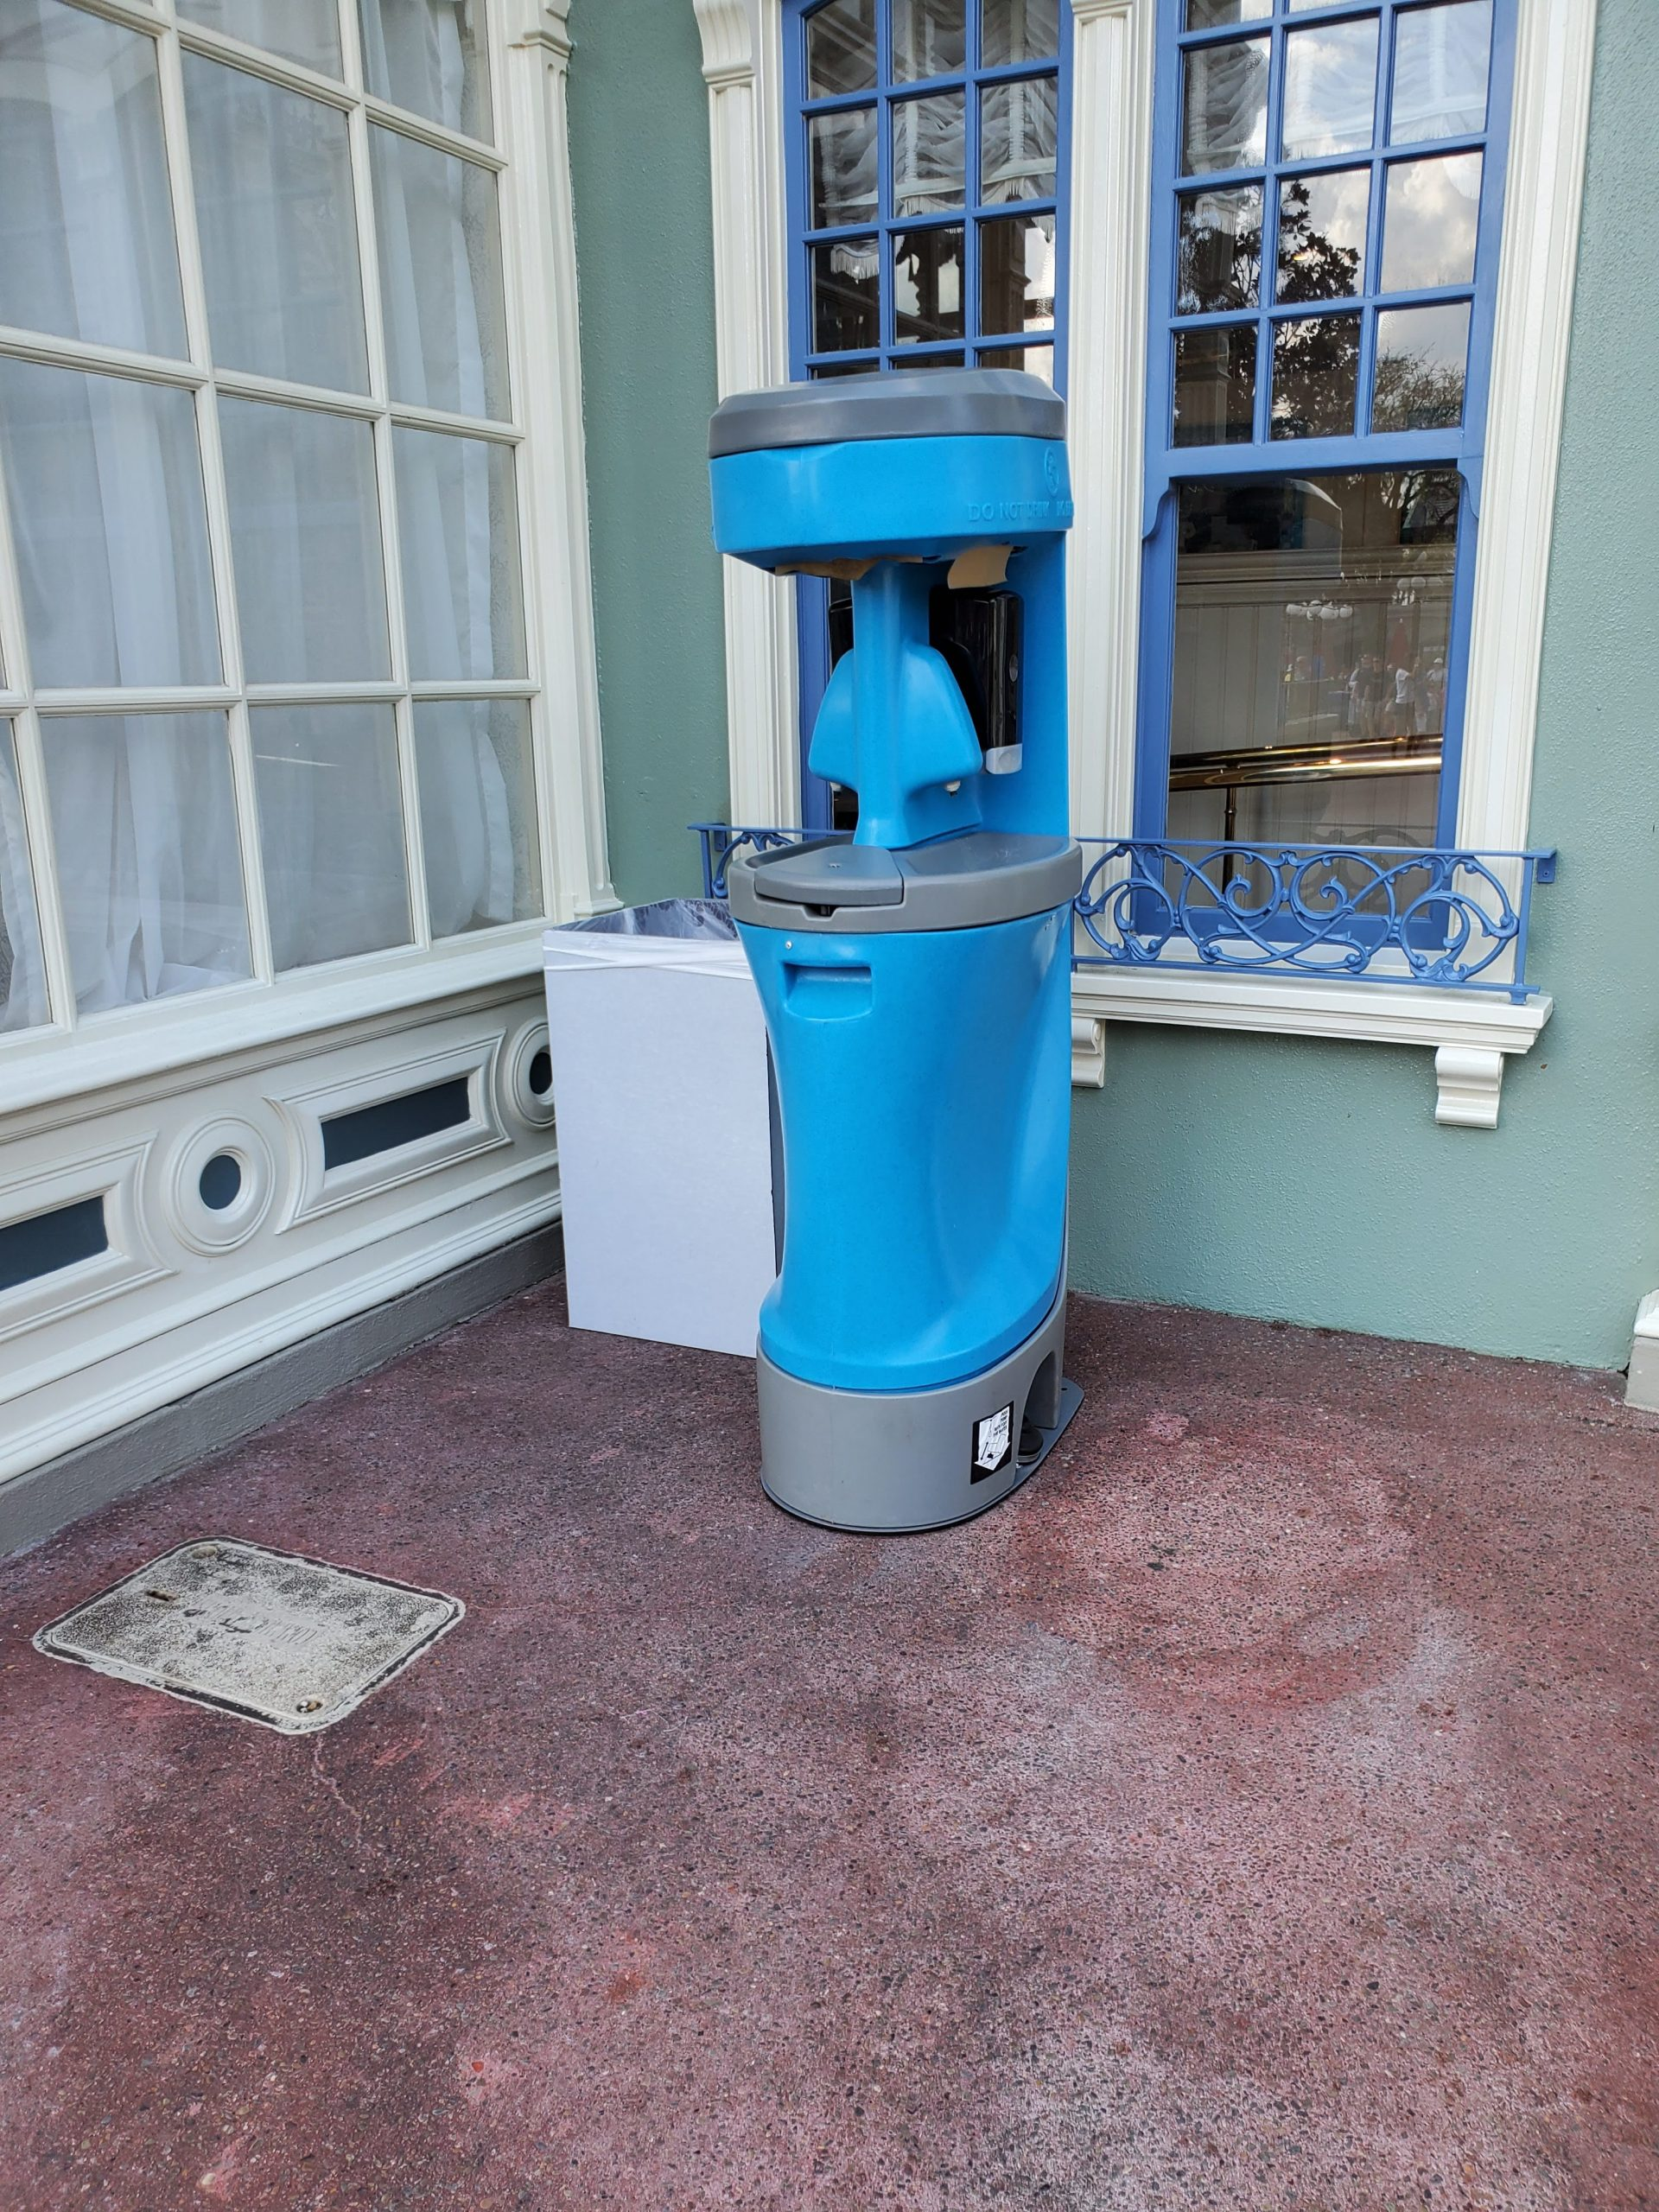 Disney wash sinks in parks